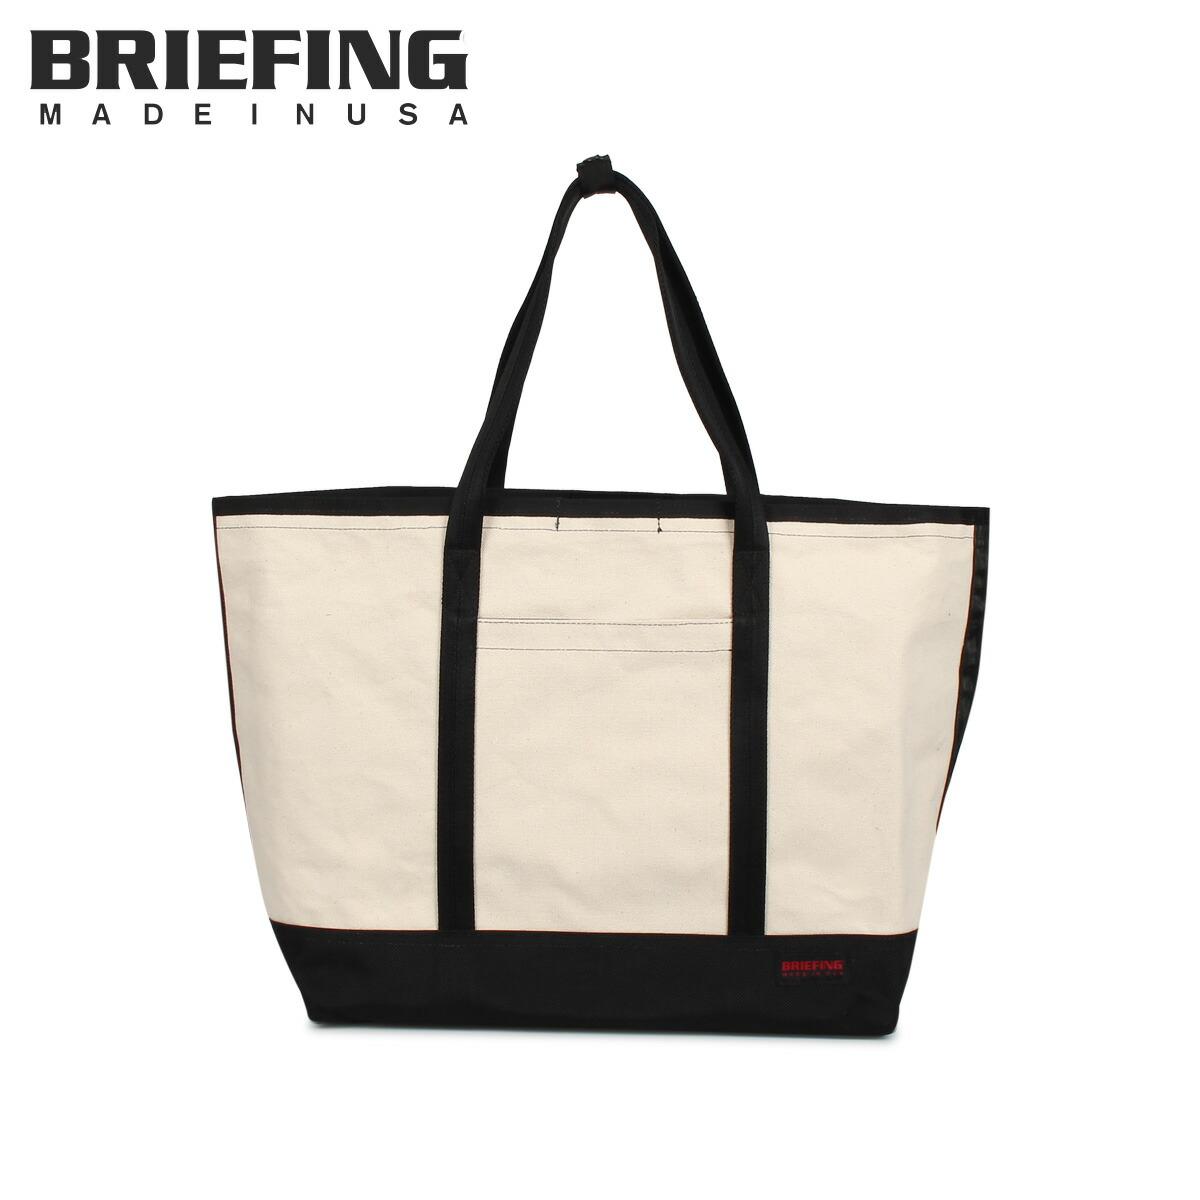 BRIEFING ブリーフィング コンビ トート バッグ トートバッグ メンズ COMBI TOTE L ブラック 黒 181304